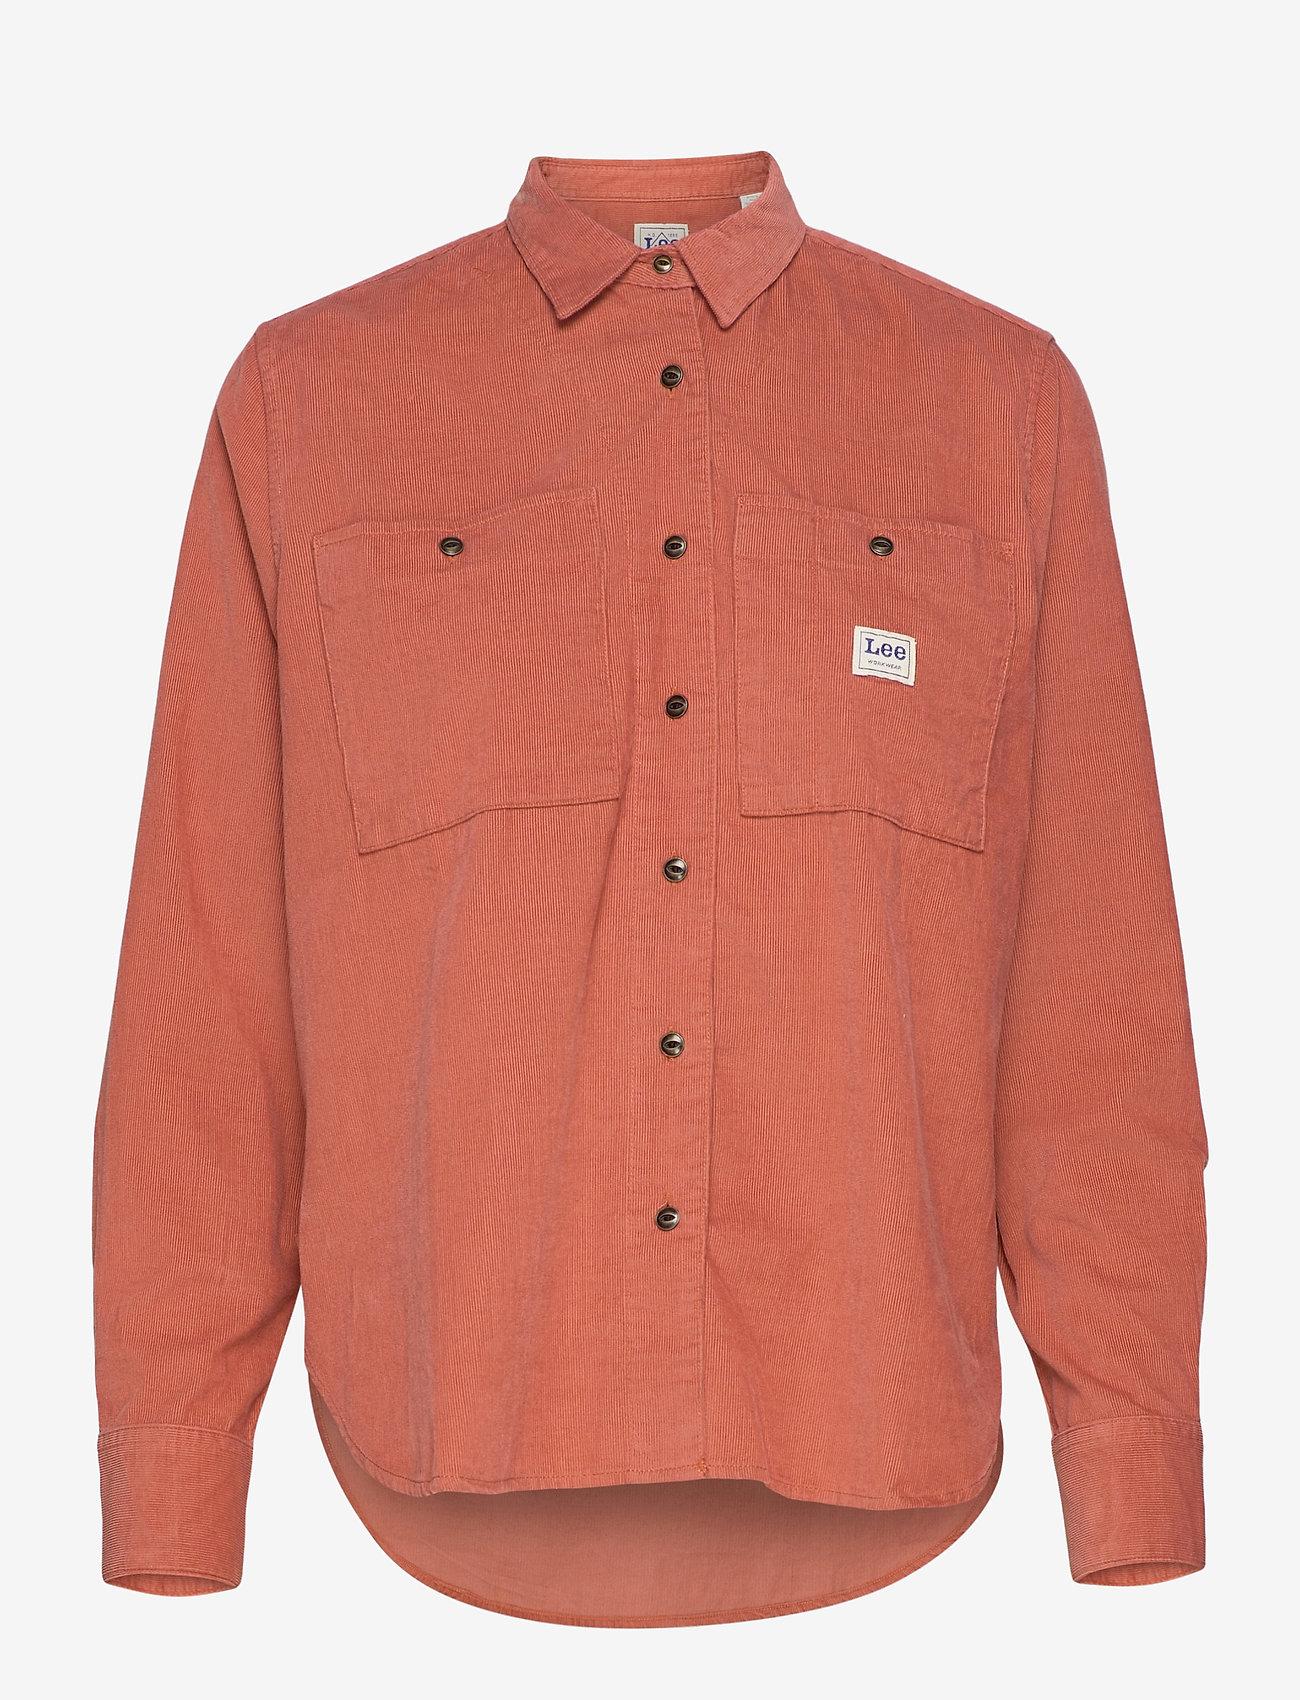 Lee Jeans - WORKER SHIRT - denim shirts - burnt ocra - 0